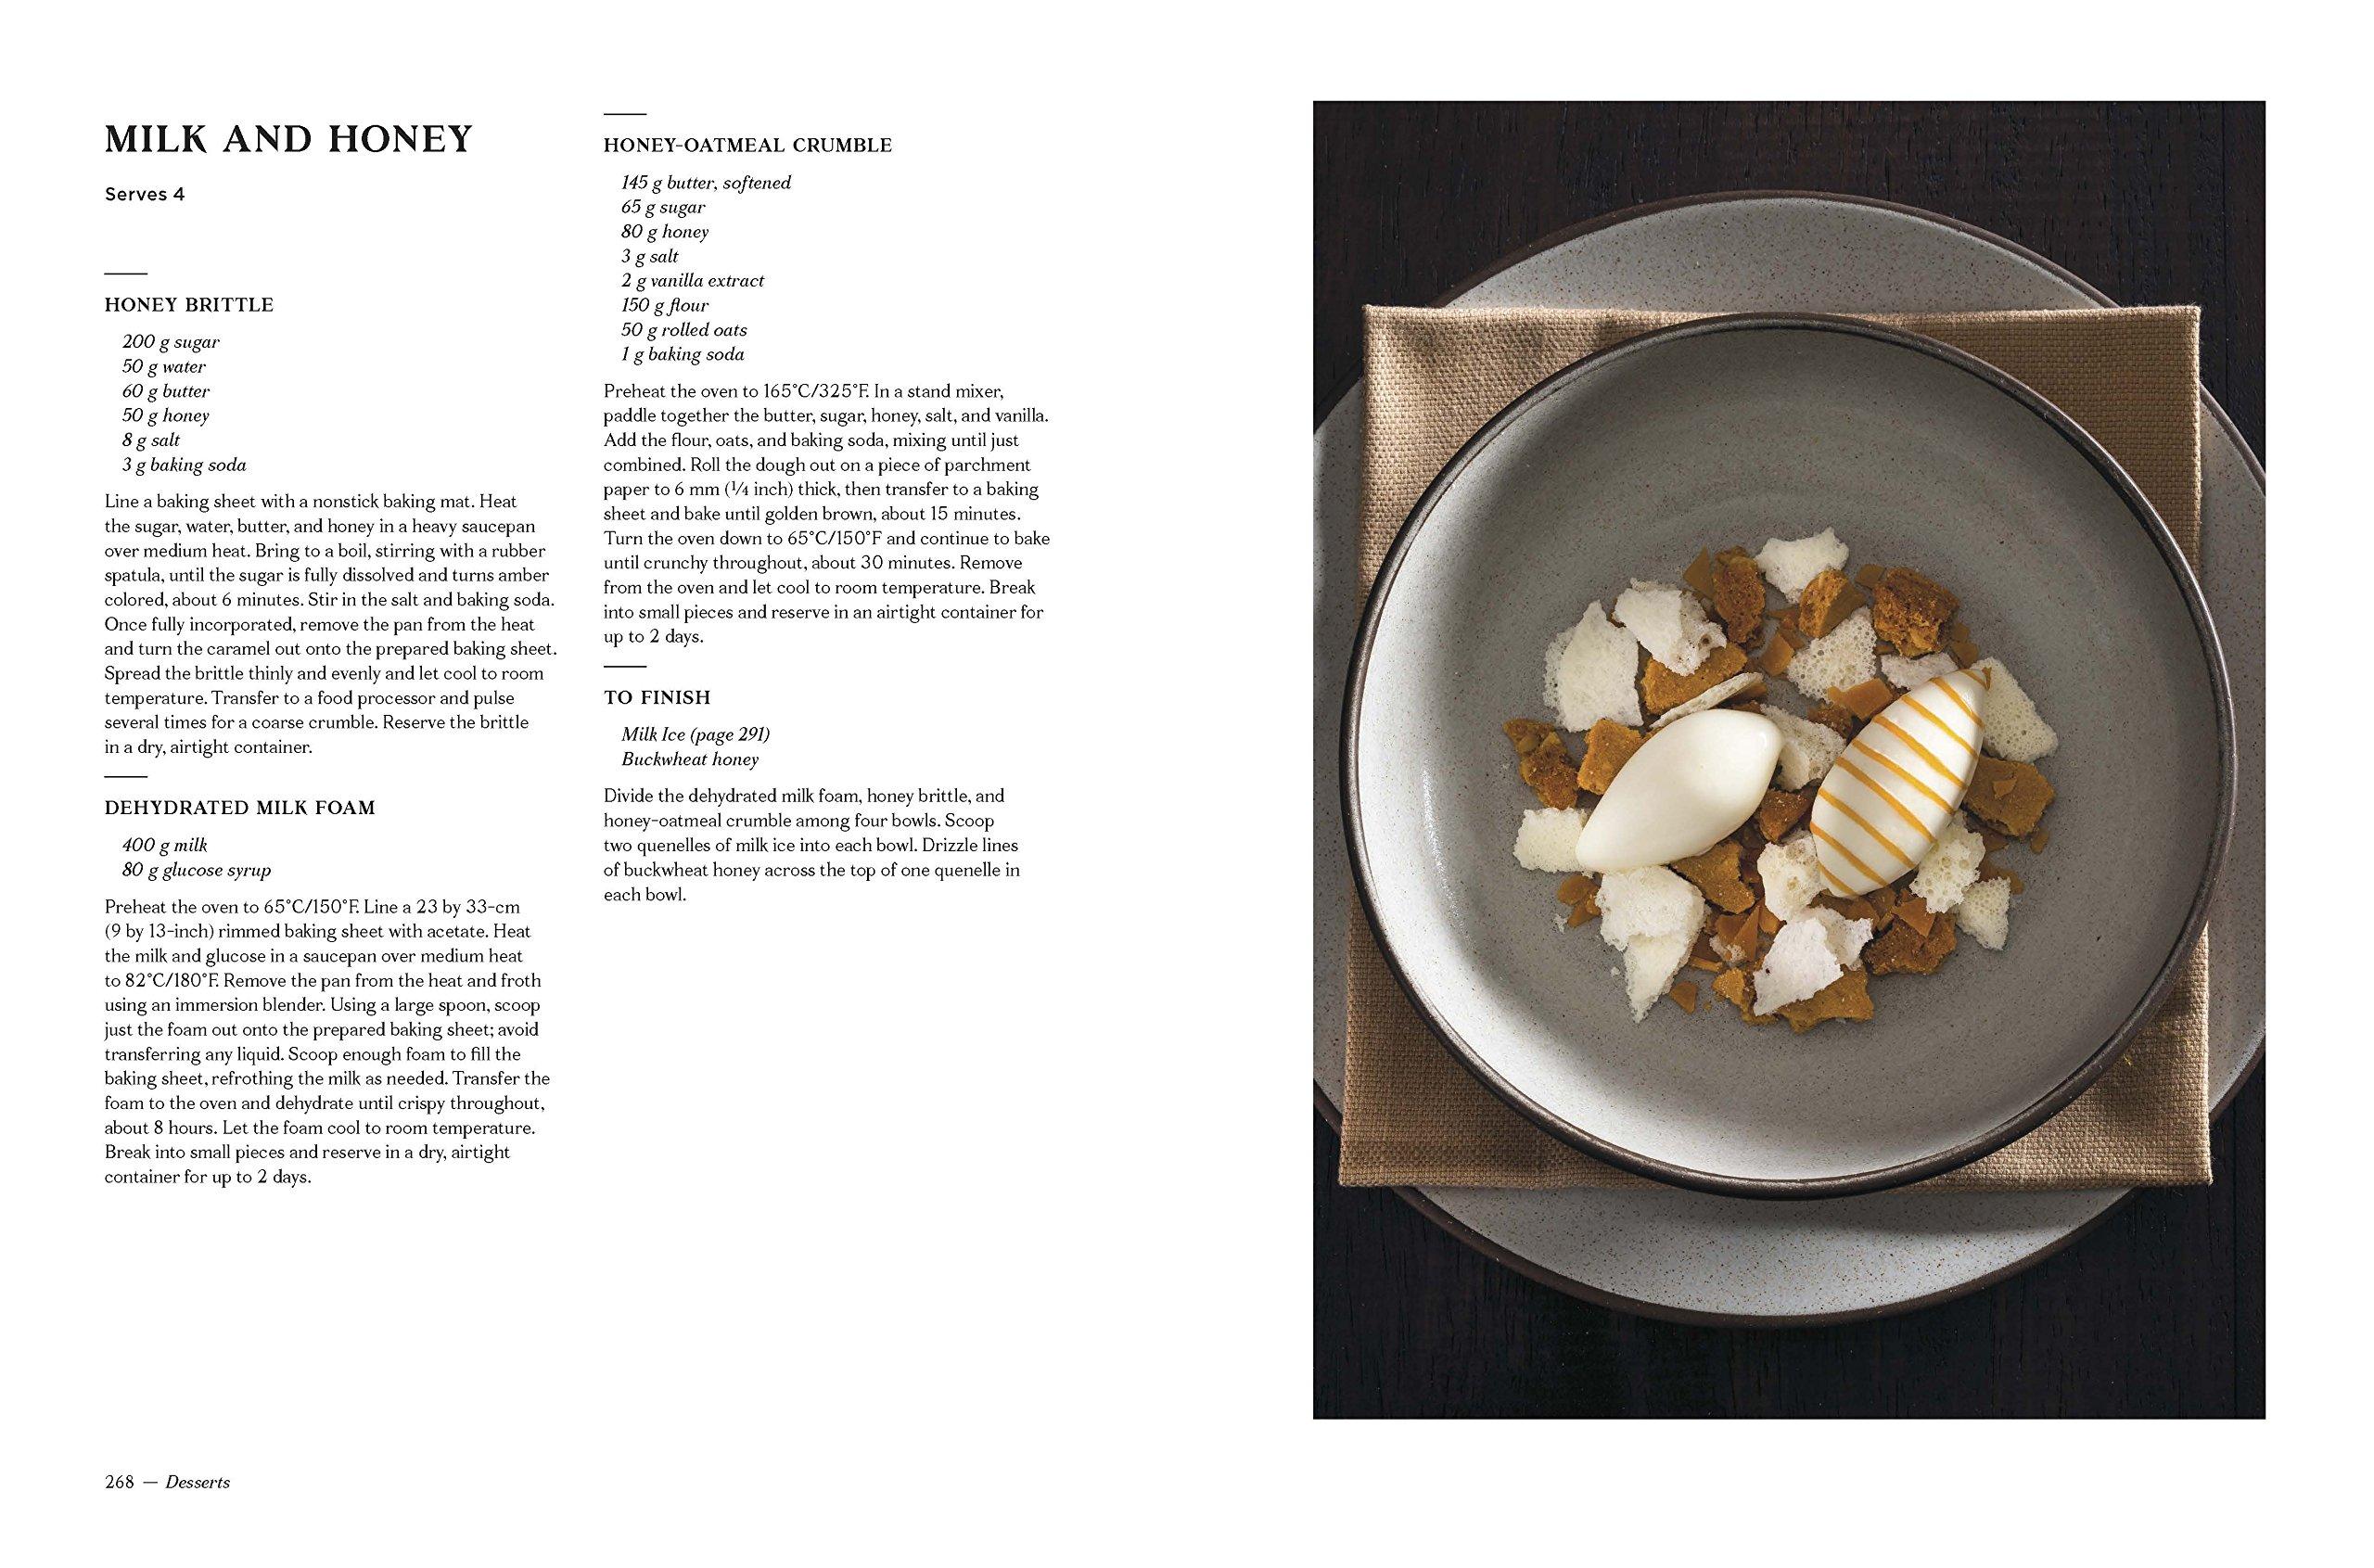 The nomad cookbook daniel humm will guidara leo robitschek the nomad cookbook daniel humm will guidara leo robitschek francesco tonelli 0787721912392 amazon books forumfinder Images